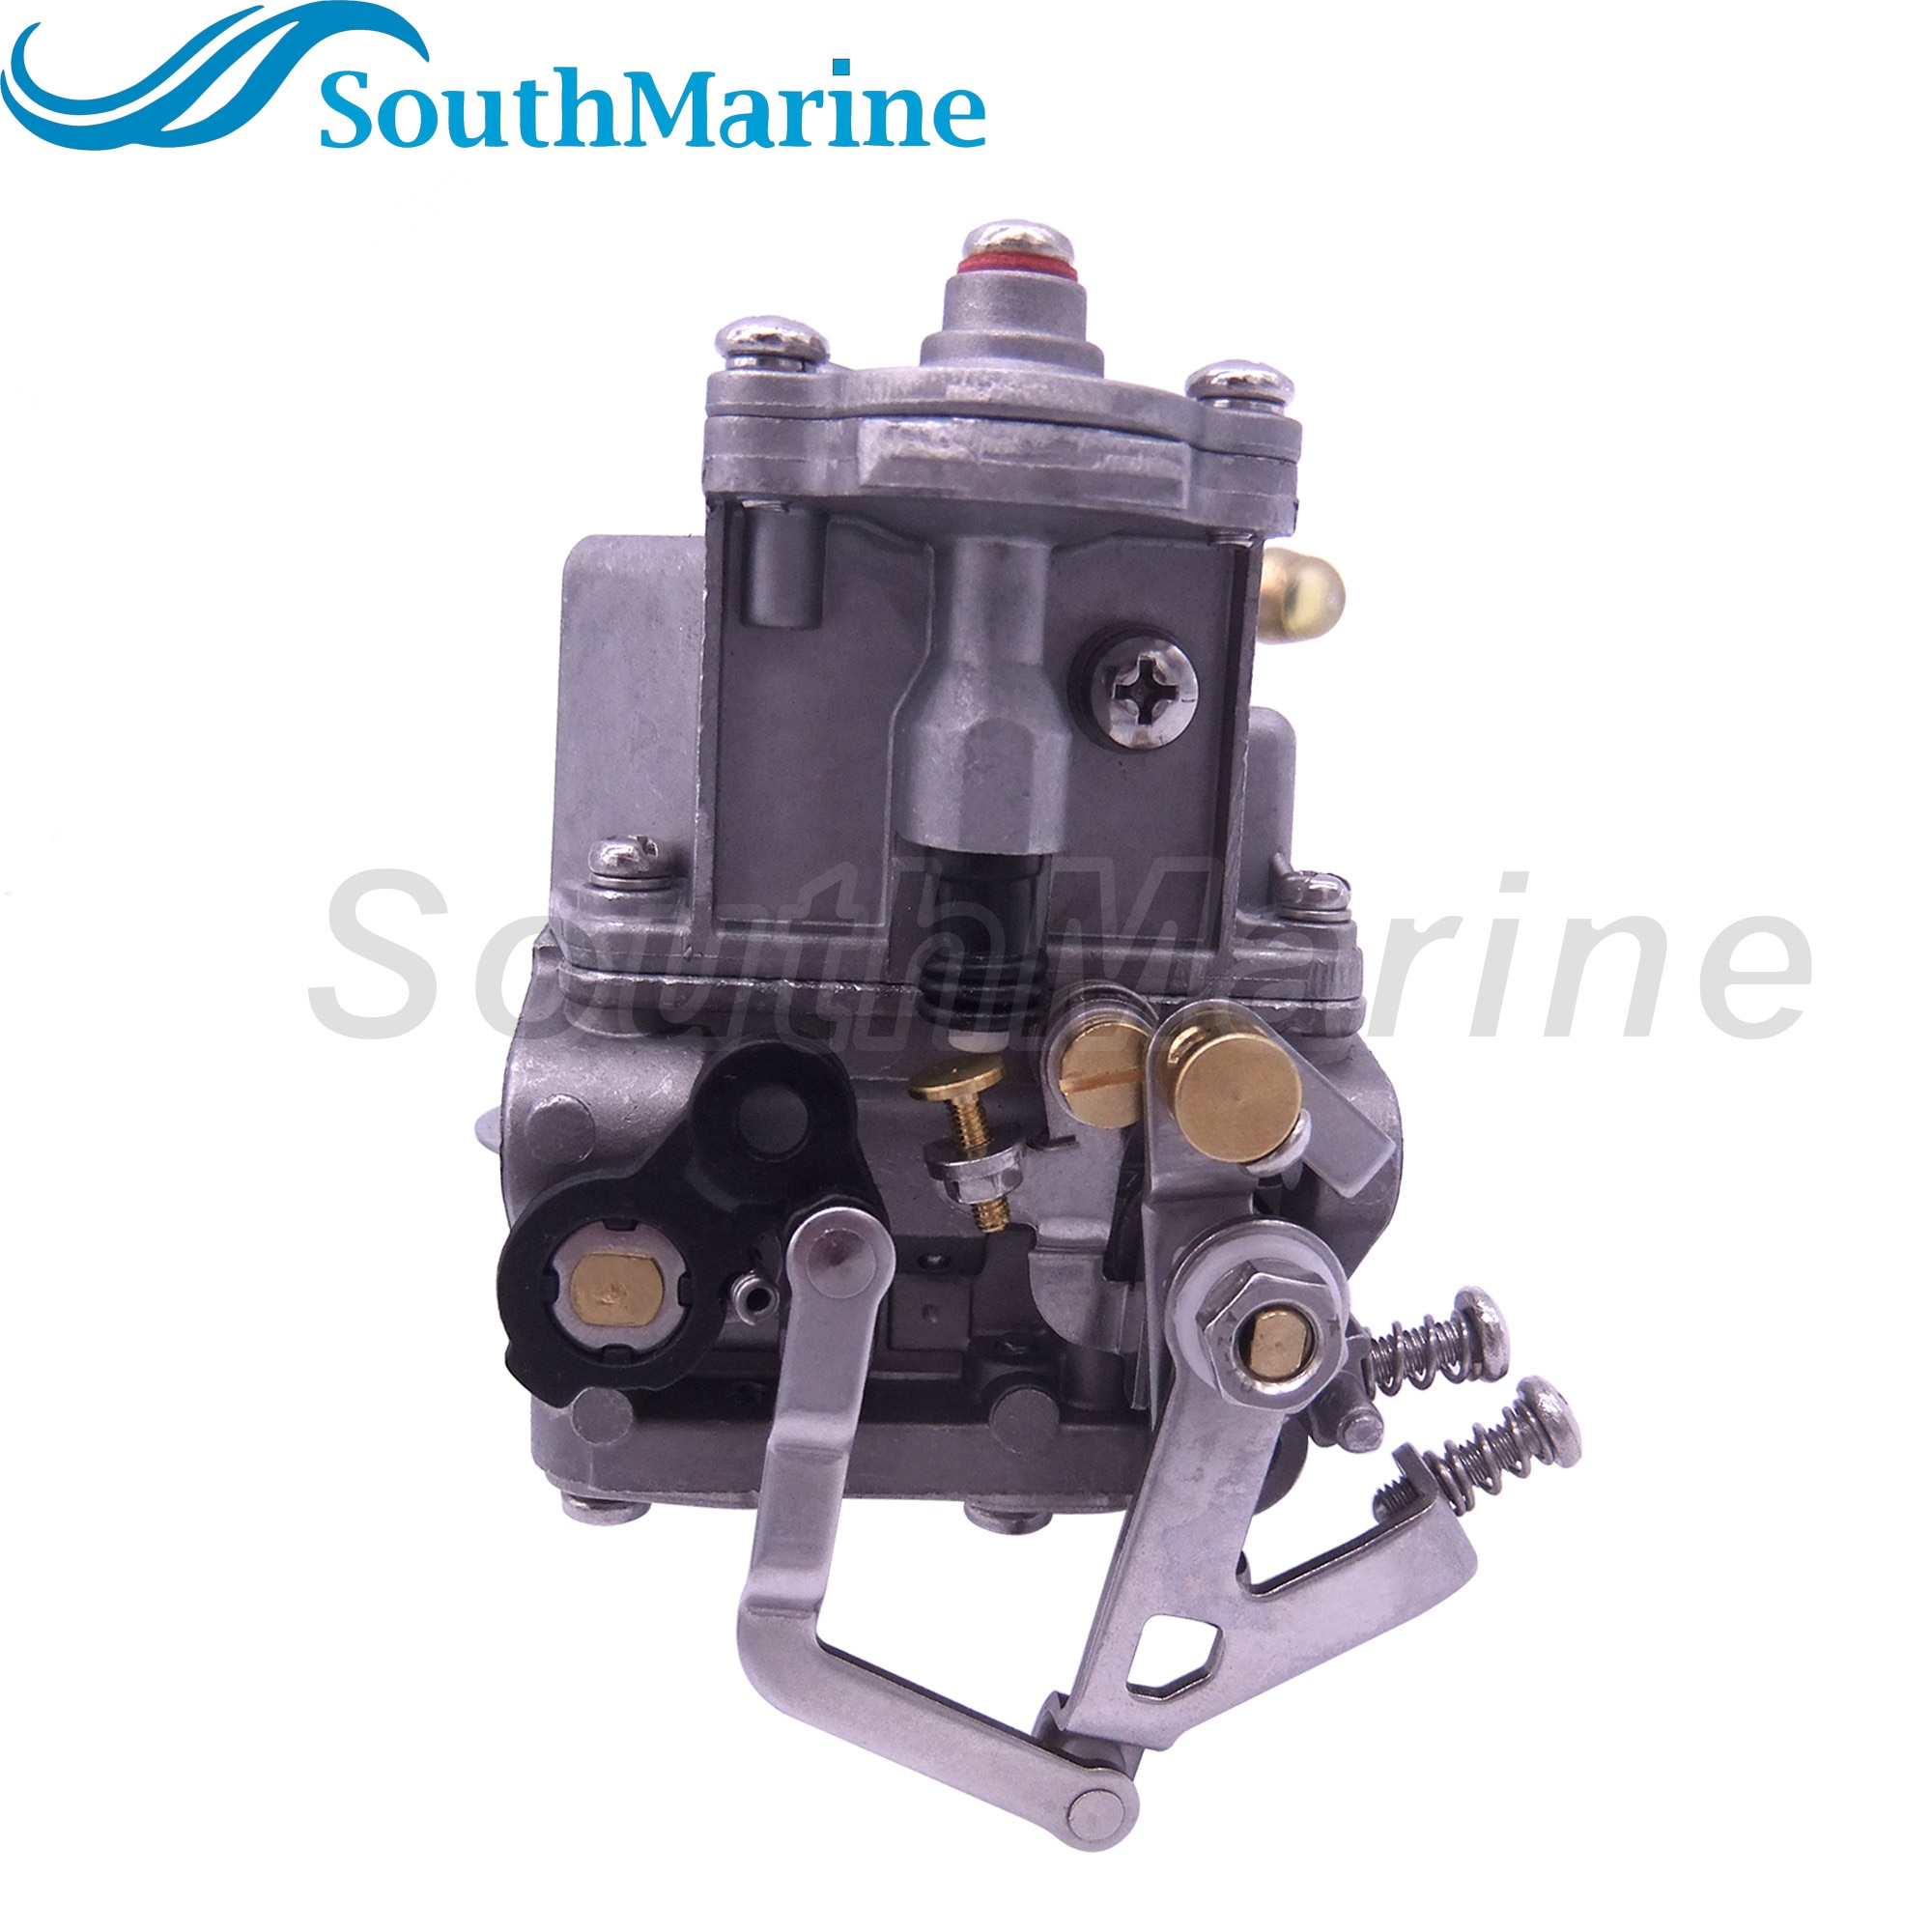 Boat Motor 3BH-03100-0 3AZ-03133-0 3BH031000 3AZ031330 3BH031000M 3AZ031330M Carburetor Assembly for